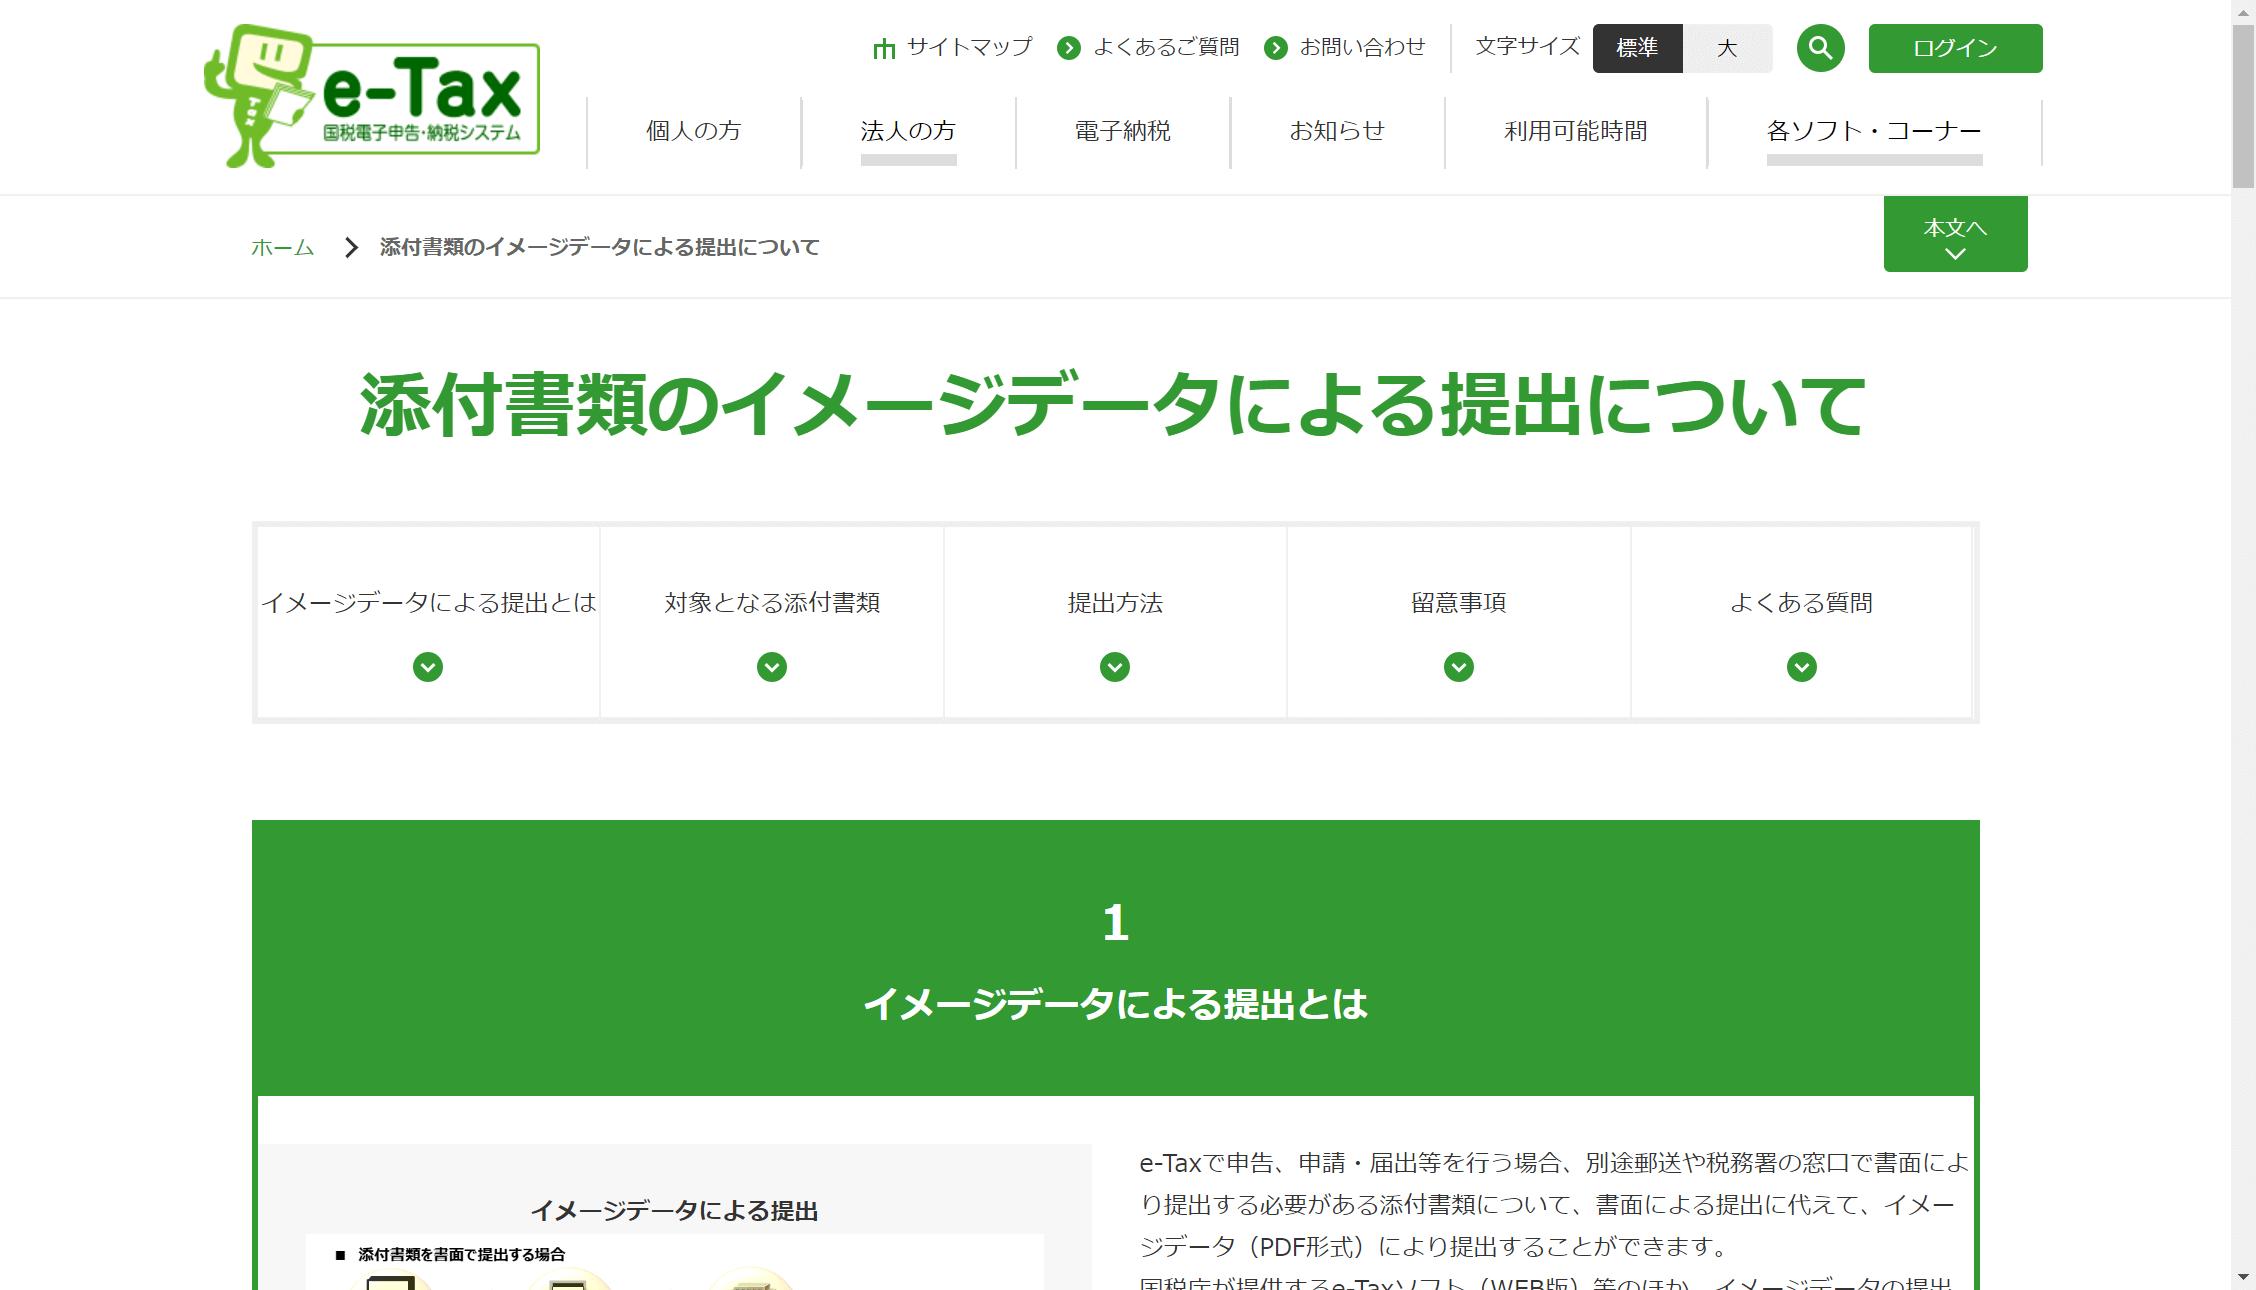 E 書類 tax 申告 確定 添付